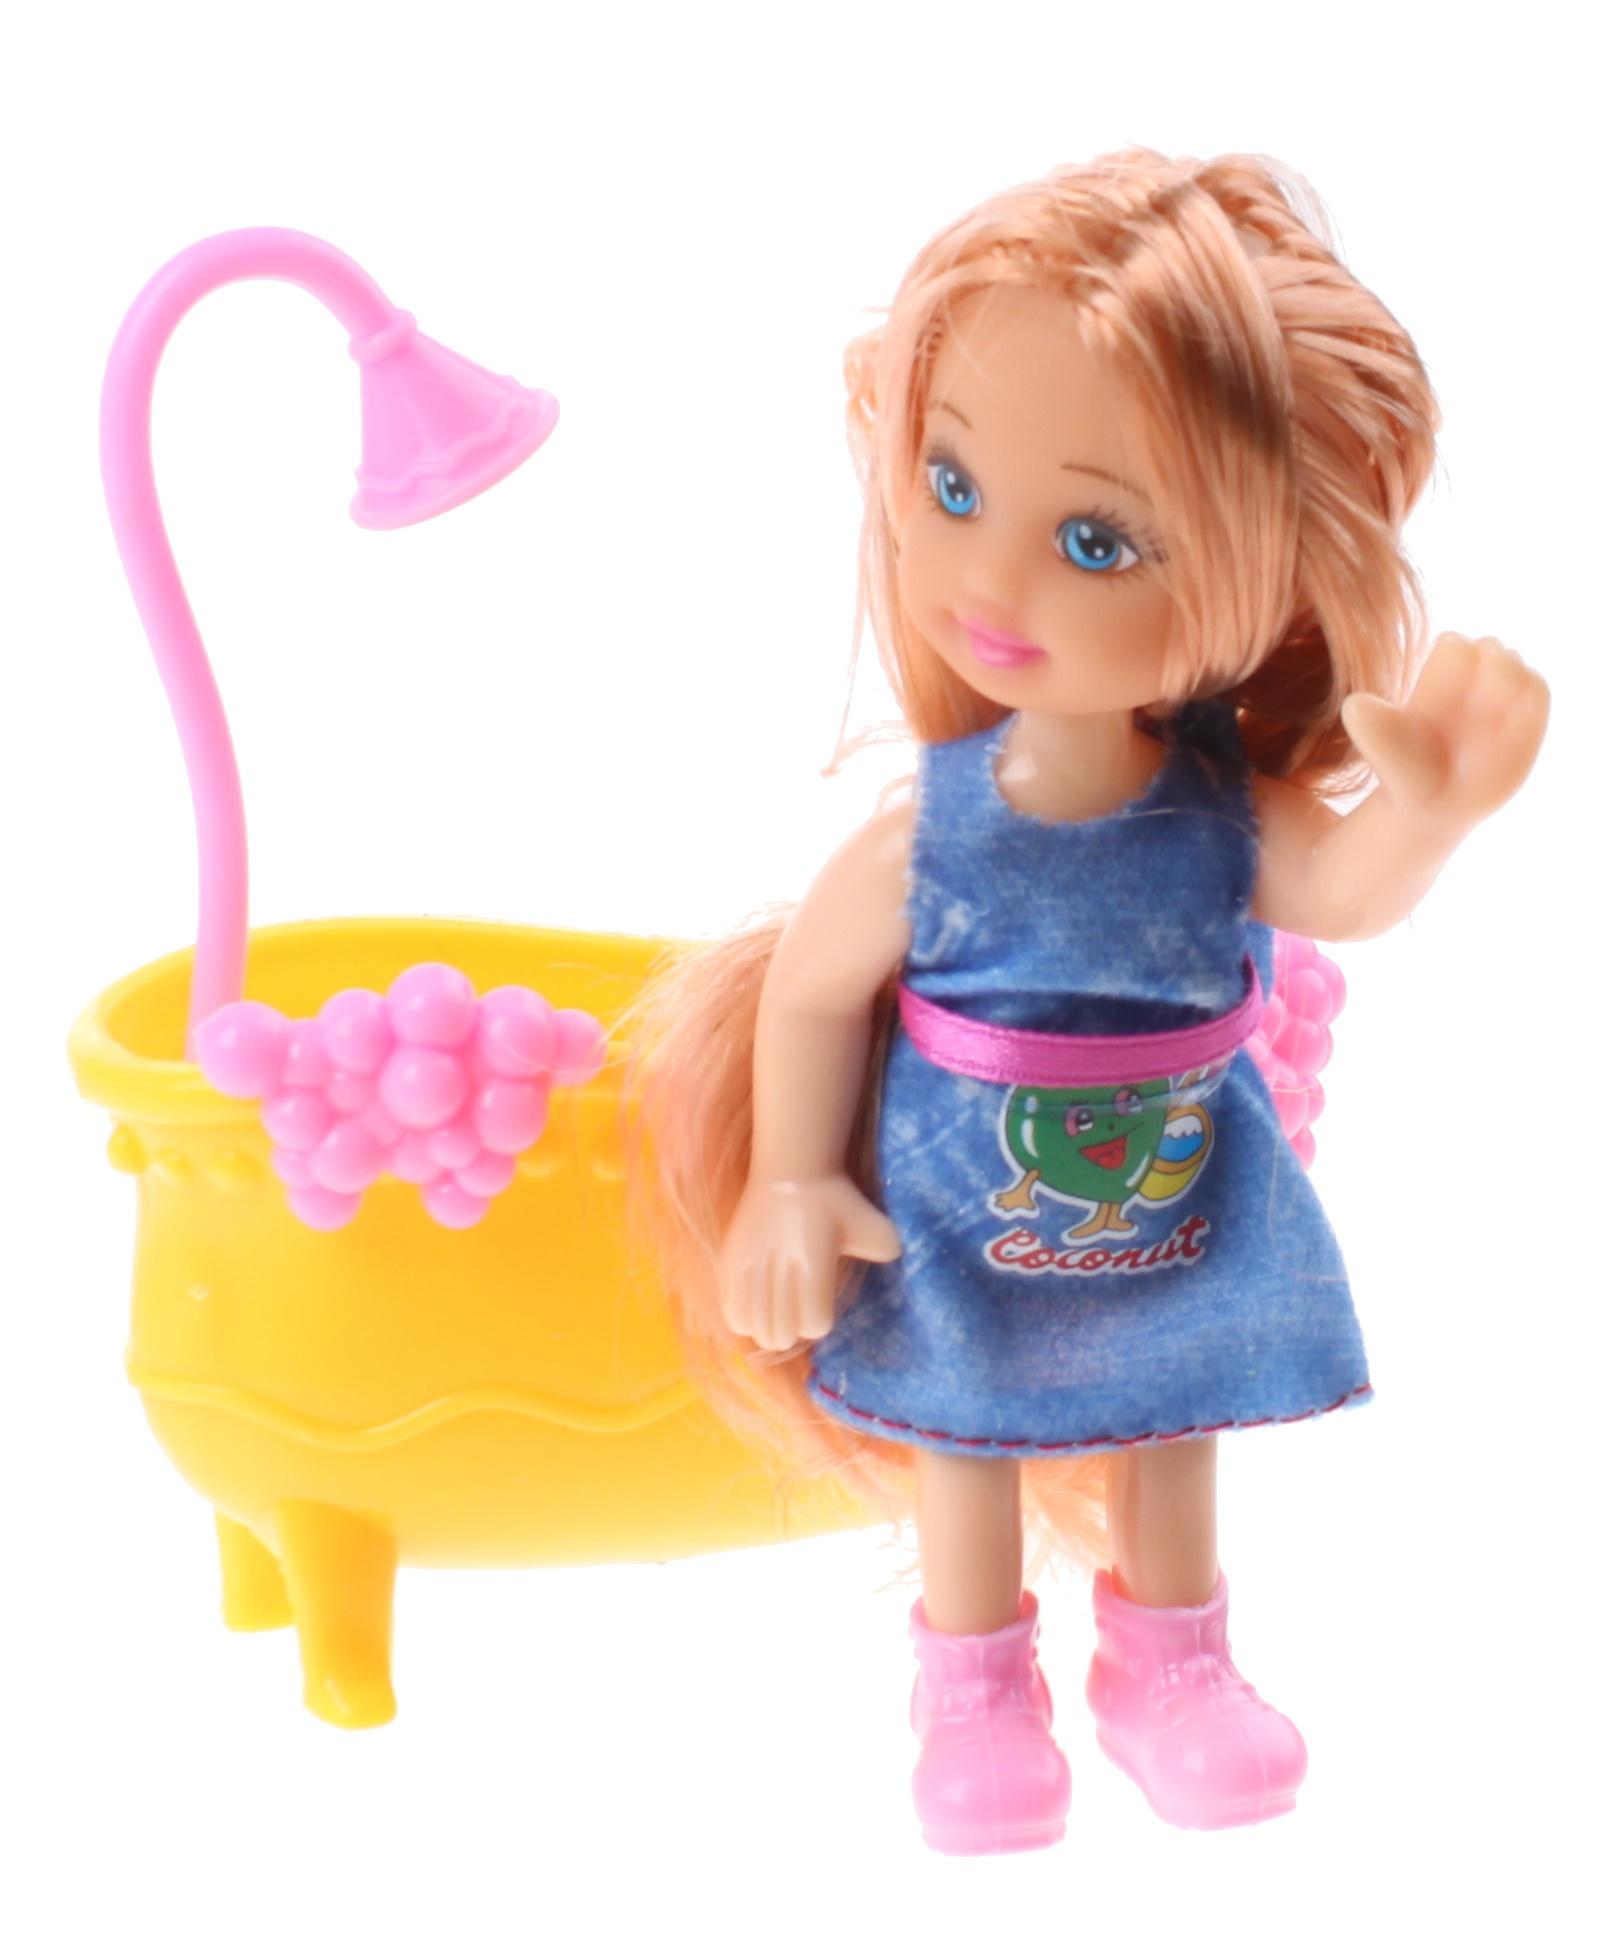 Jonotoys Teenager-Puppe Patty 12 cm Mädchen Badezimmer - Internet-Toys